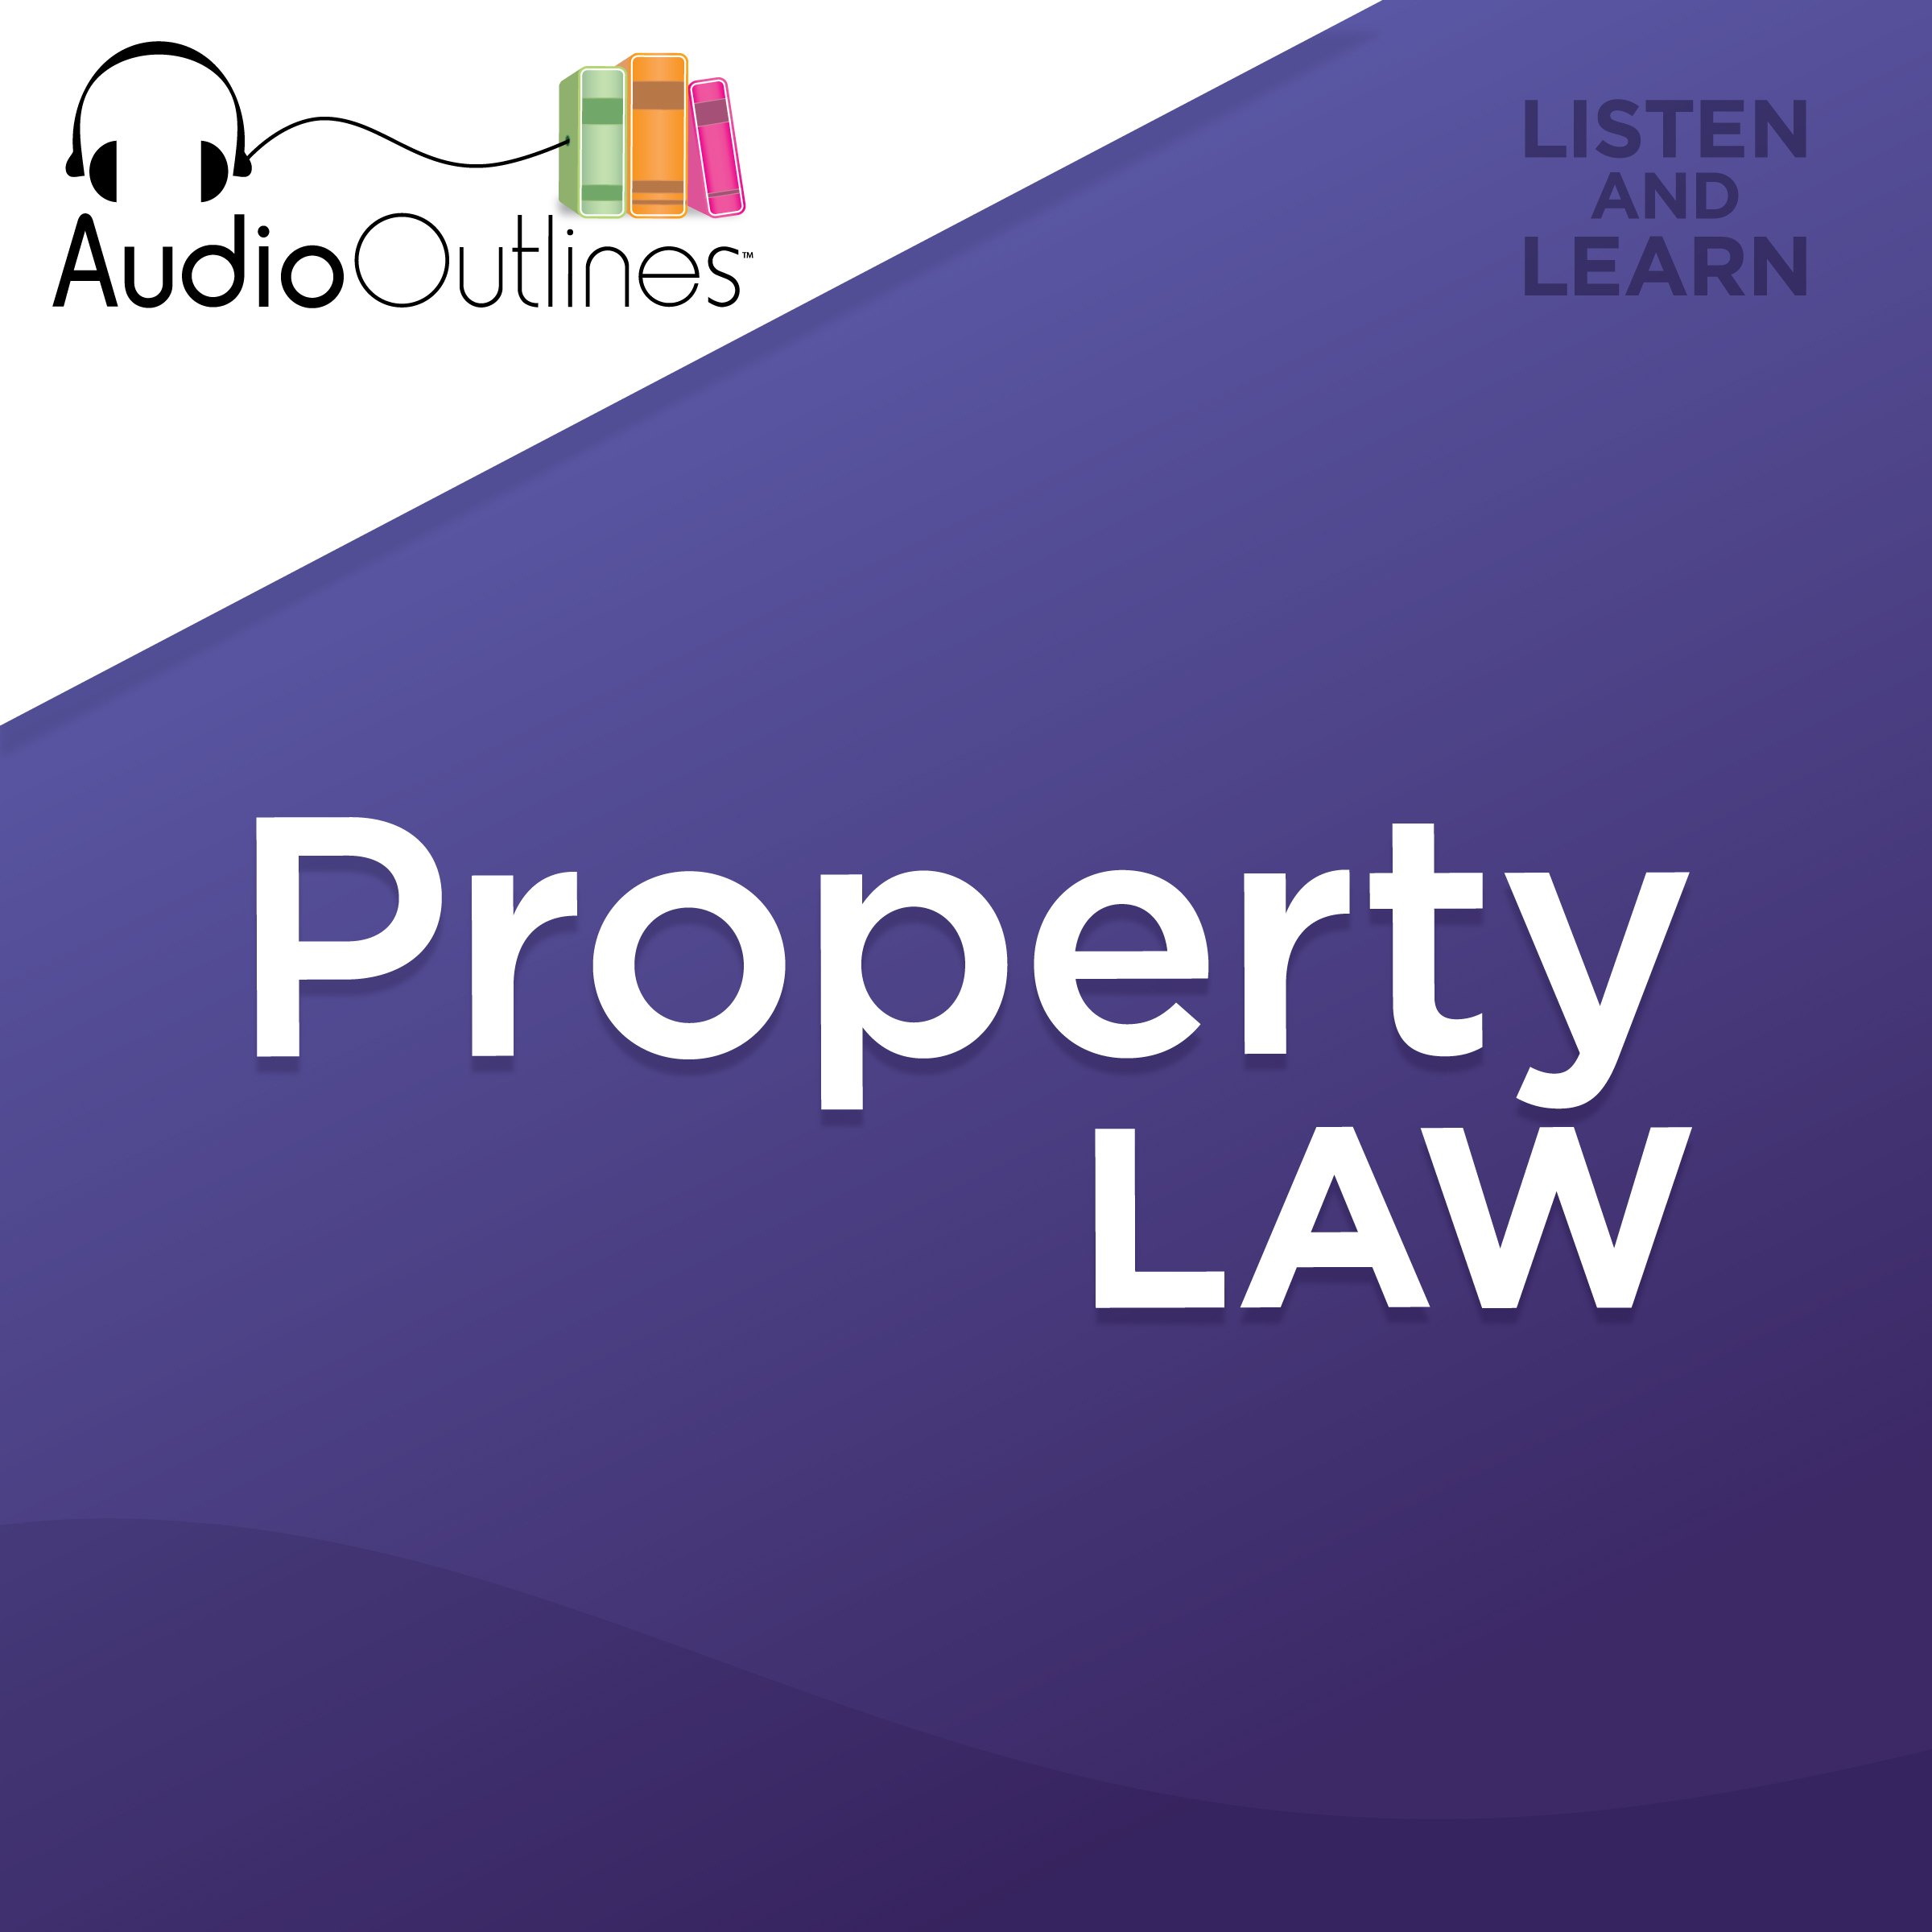 Law School Supplements Property